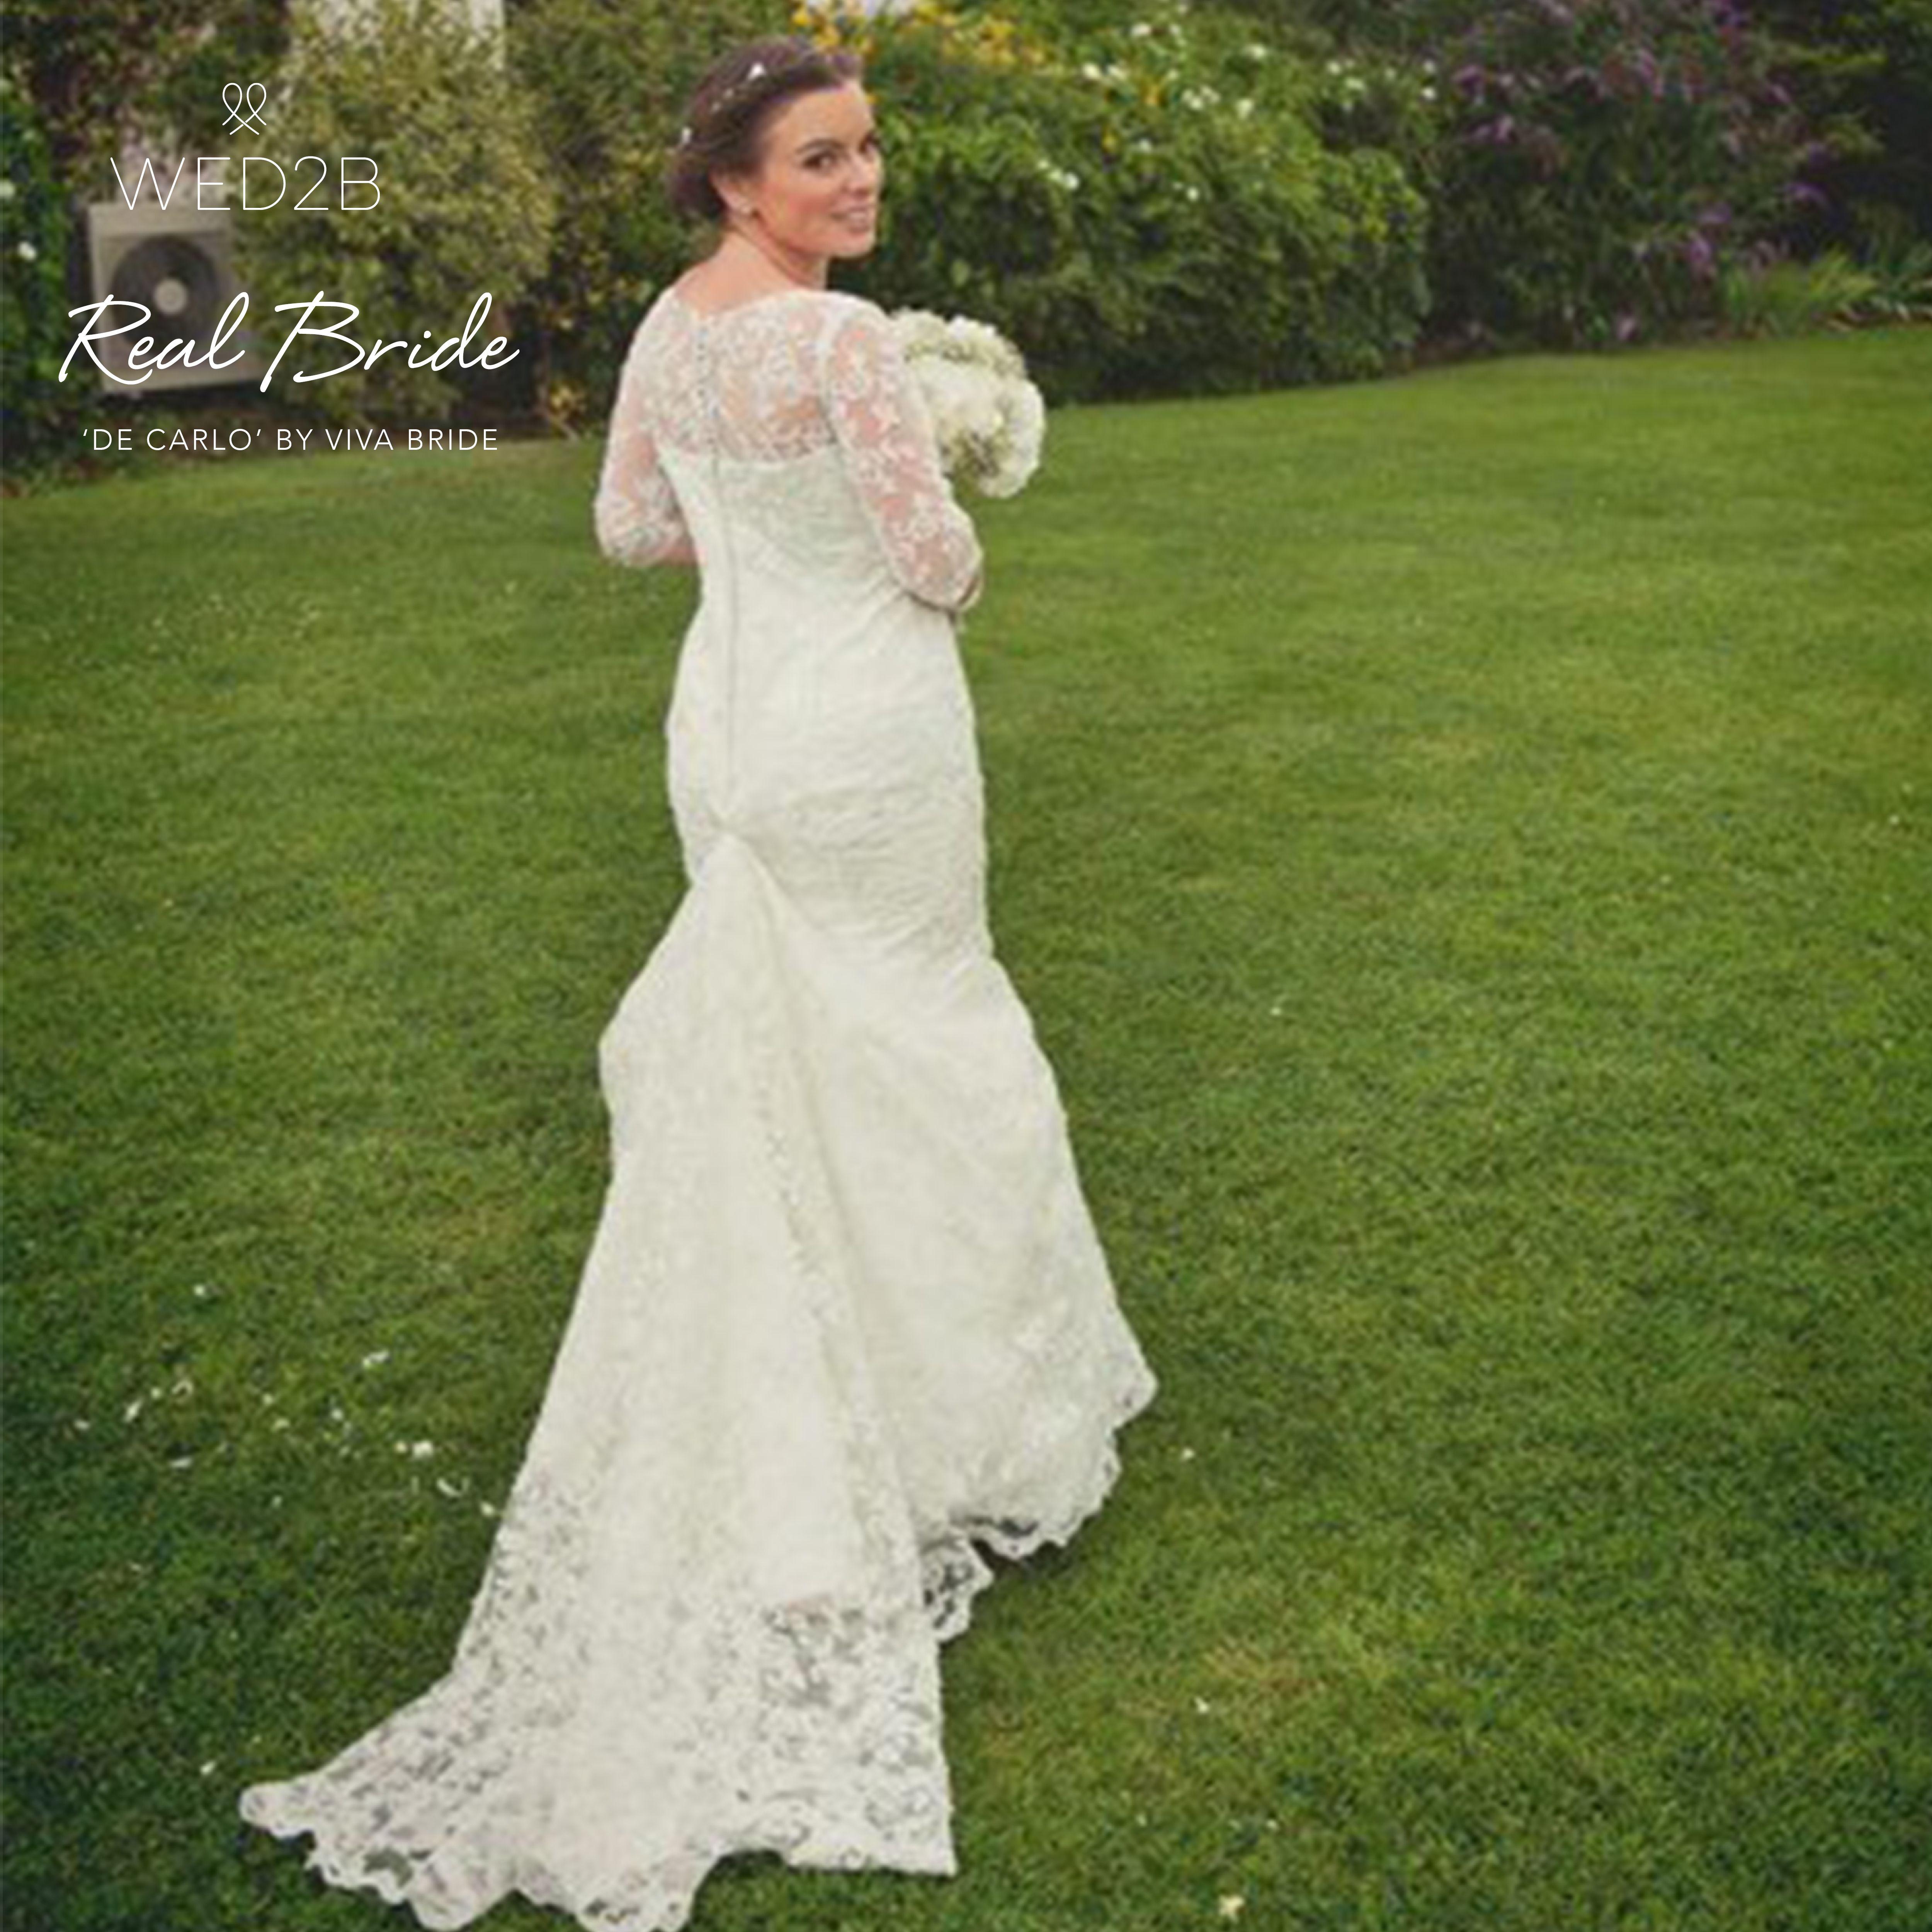 Real Brides Wed2b: Pin On Real Brides In Viva Bride